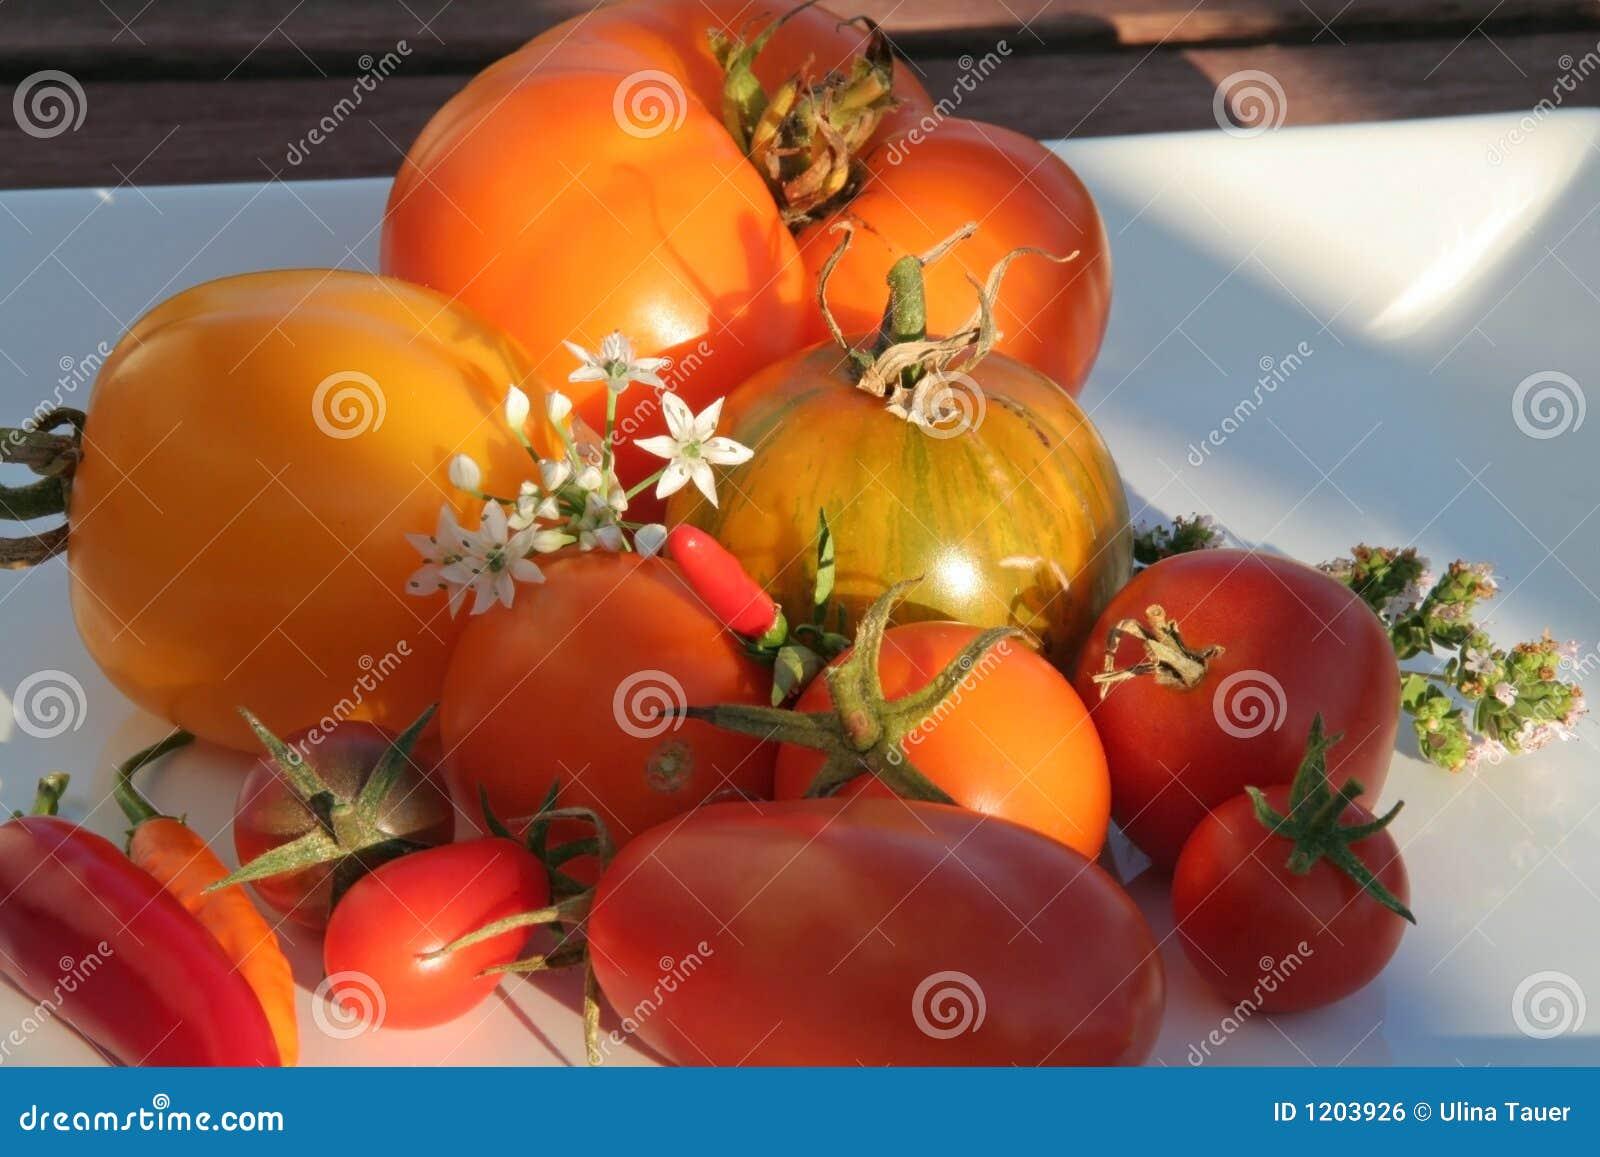 Summerly Harvest 7